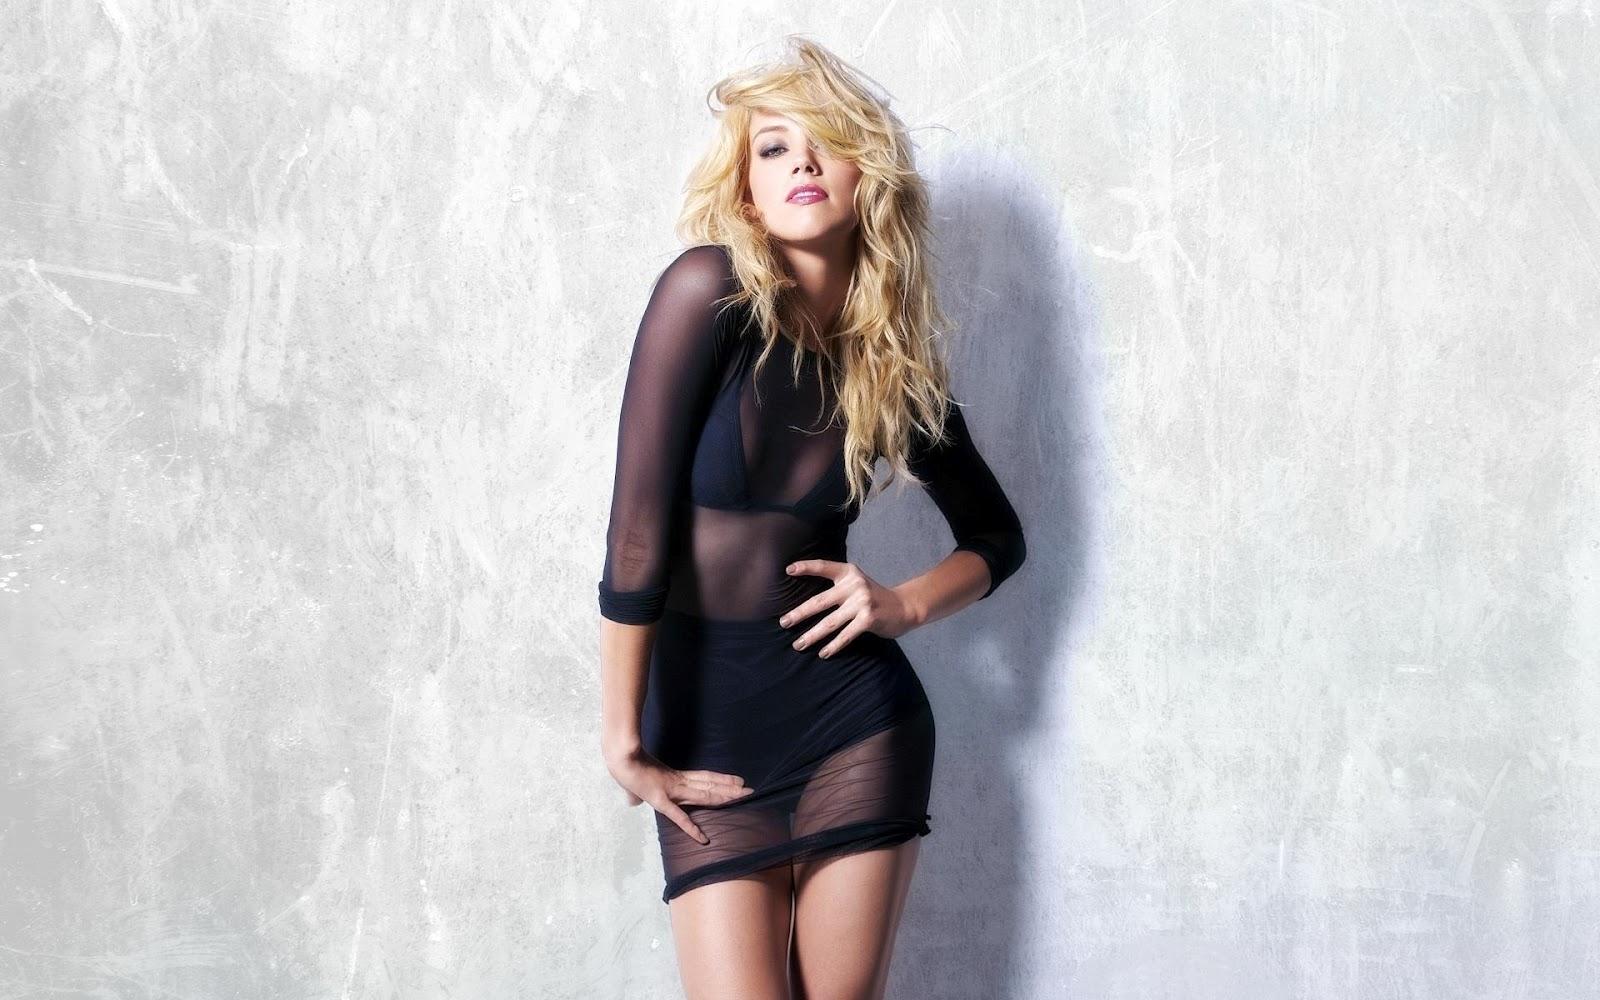 Amber Heard Hd: HD Wallpapers: AMBER HEARD FULL HD Wallpapers